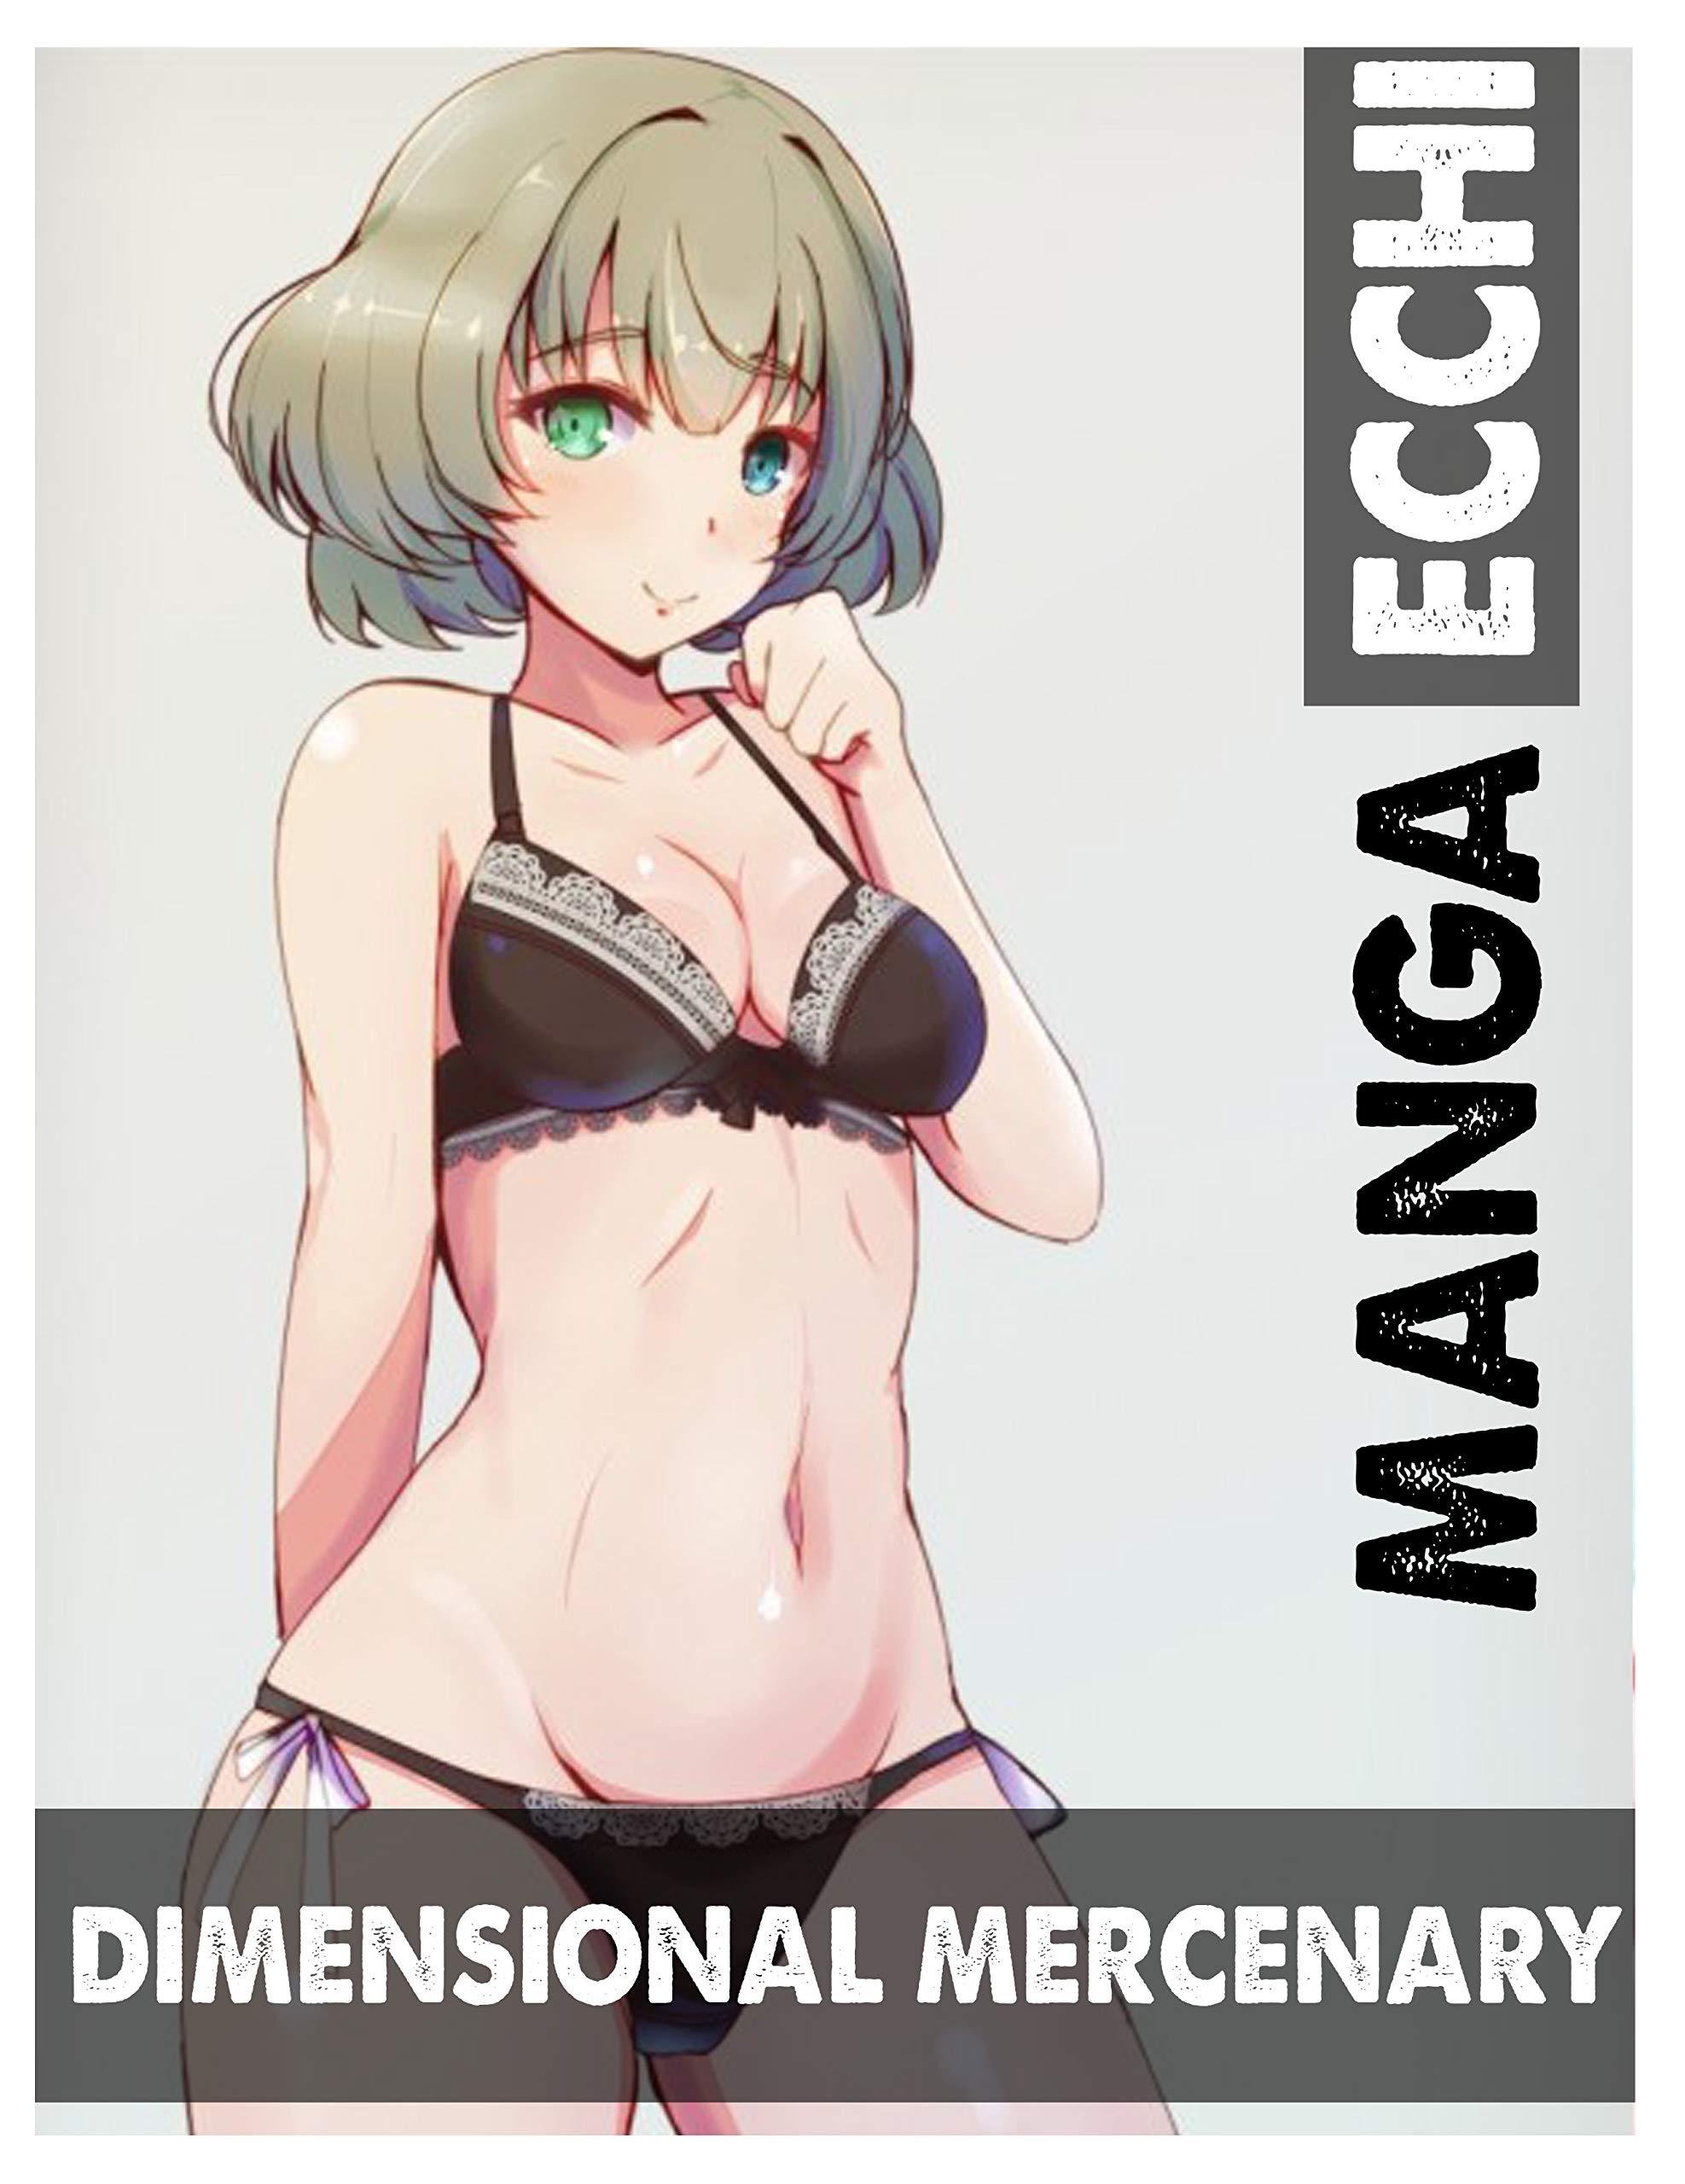 Ecchi Full Series Limited Edition Dimensional Mercenary : Shounen Ecchi Action Romance School life Manga Dimensional Mercenary